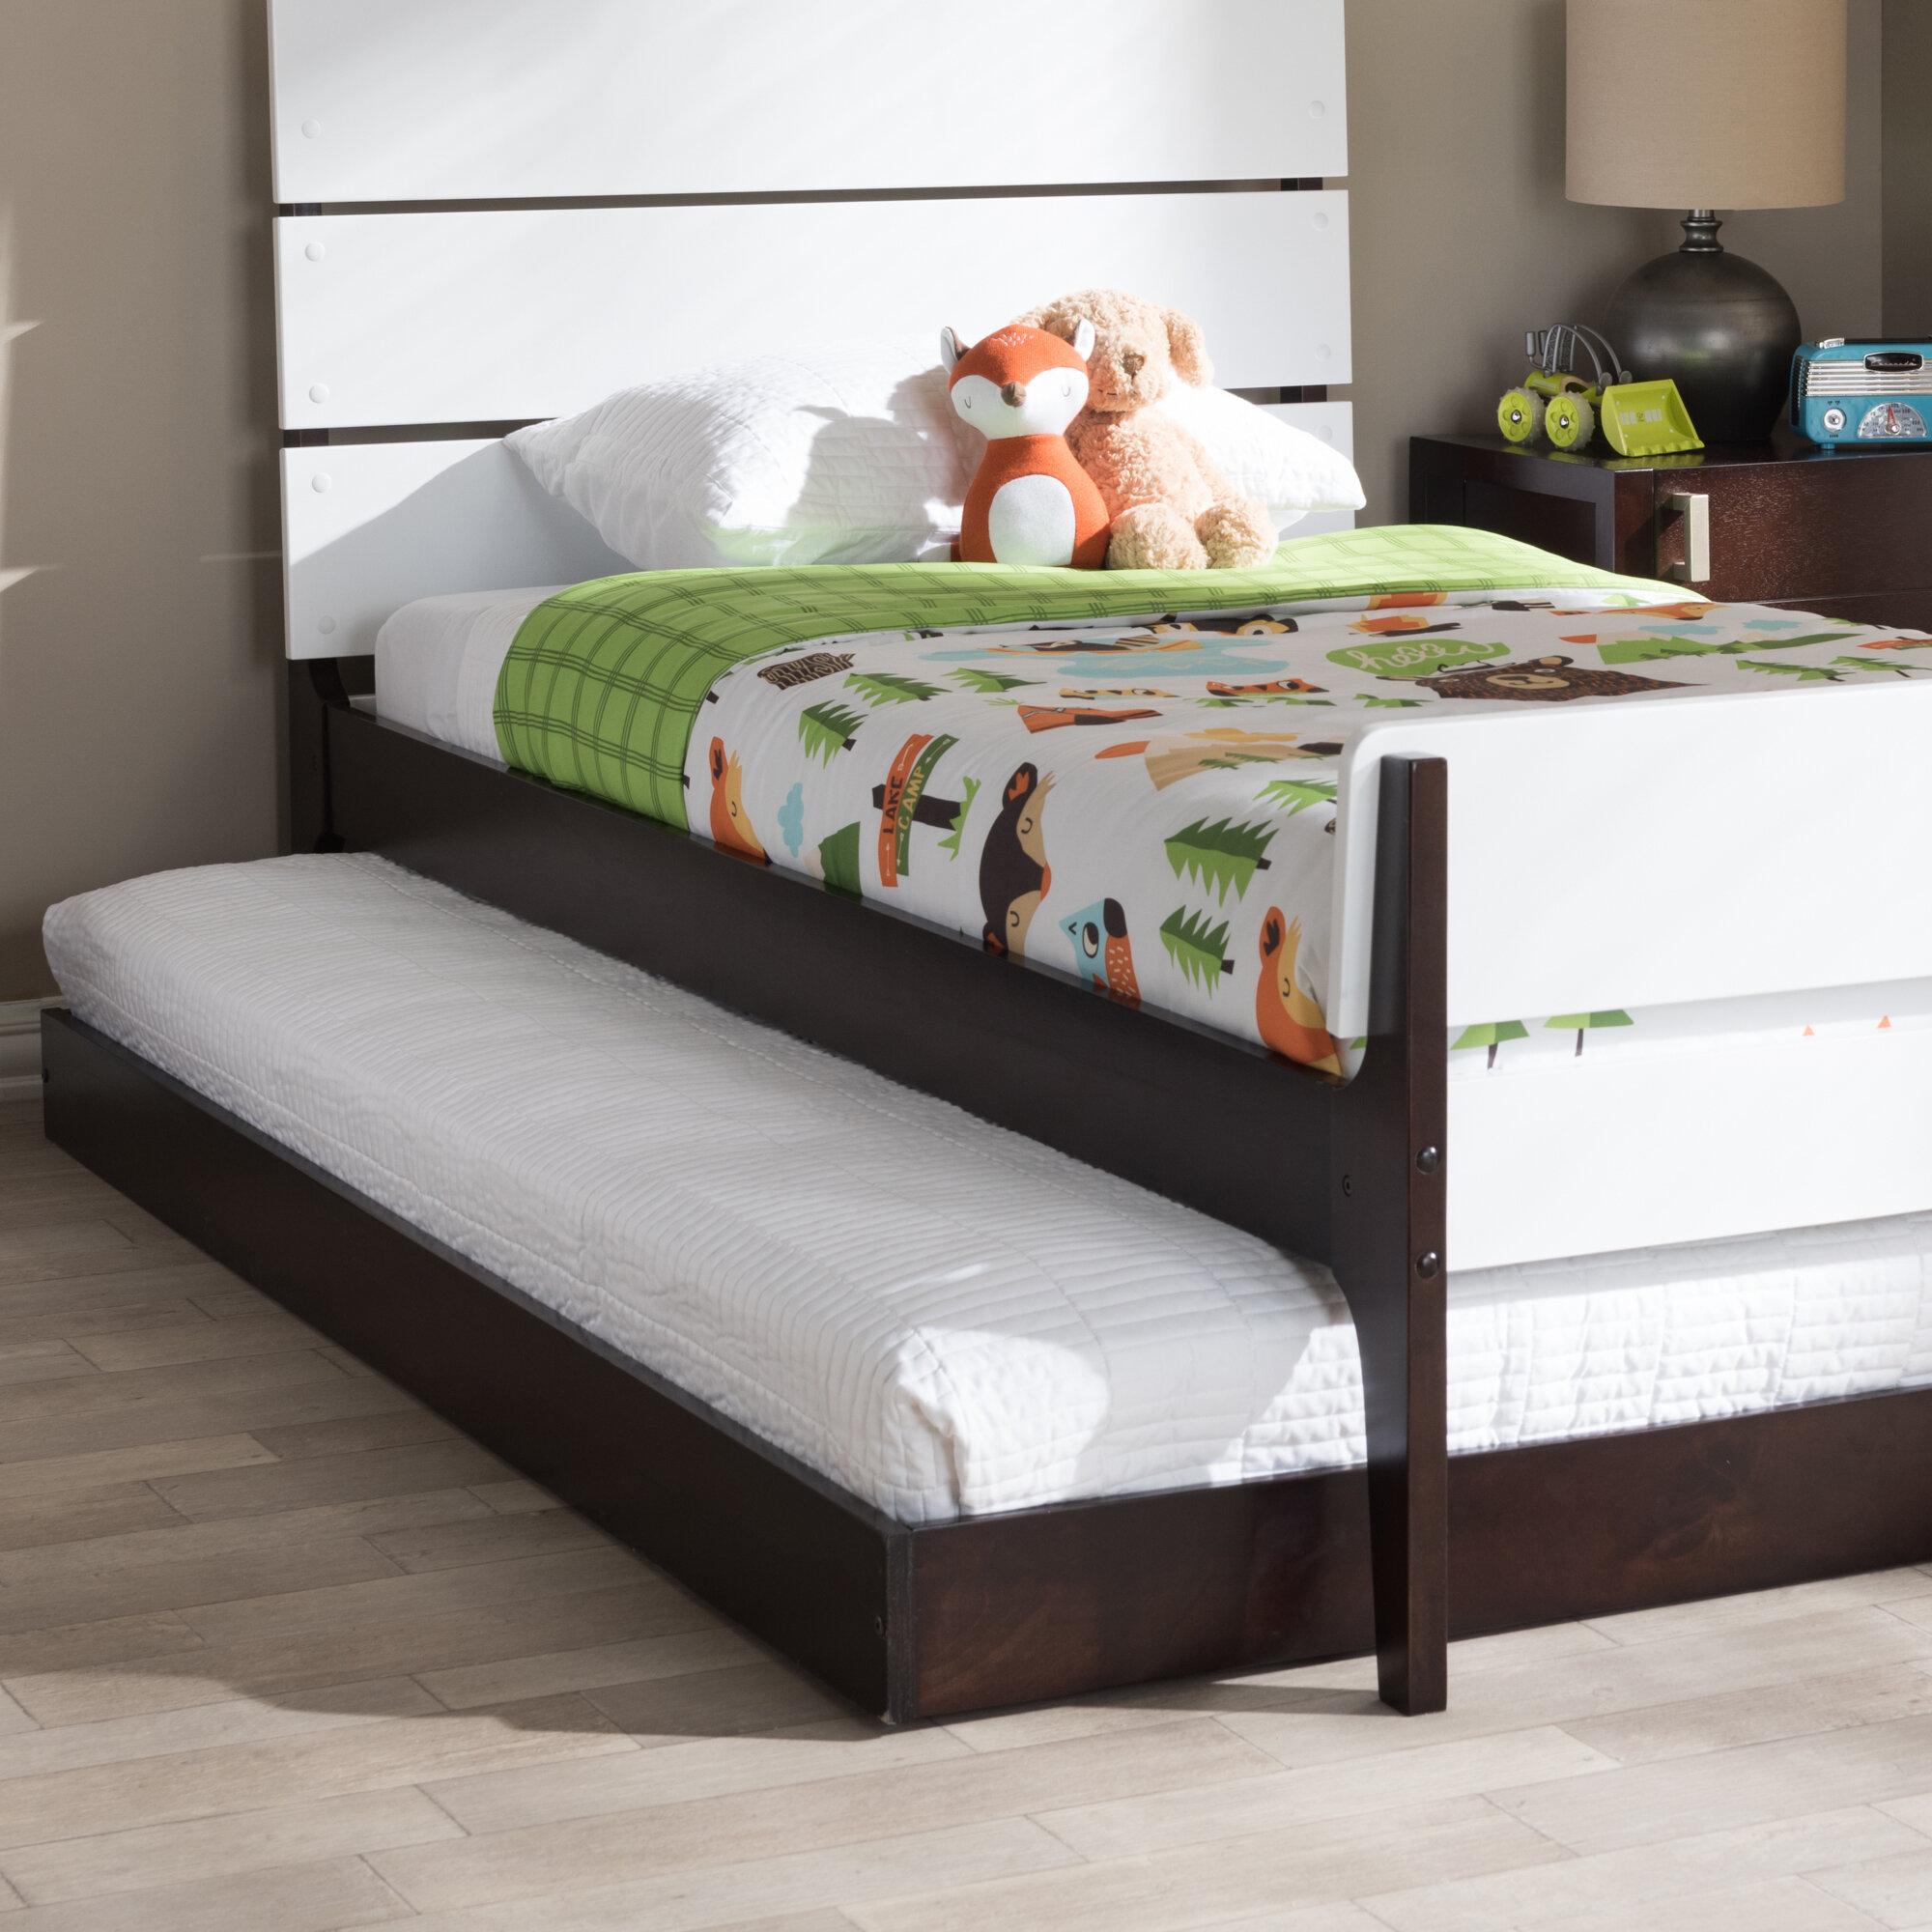 Harriet Bee Pougkeepsie Modern And Contemporary Twin Platform Bed